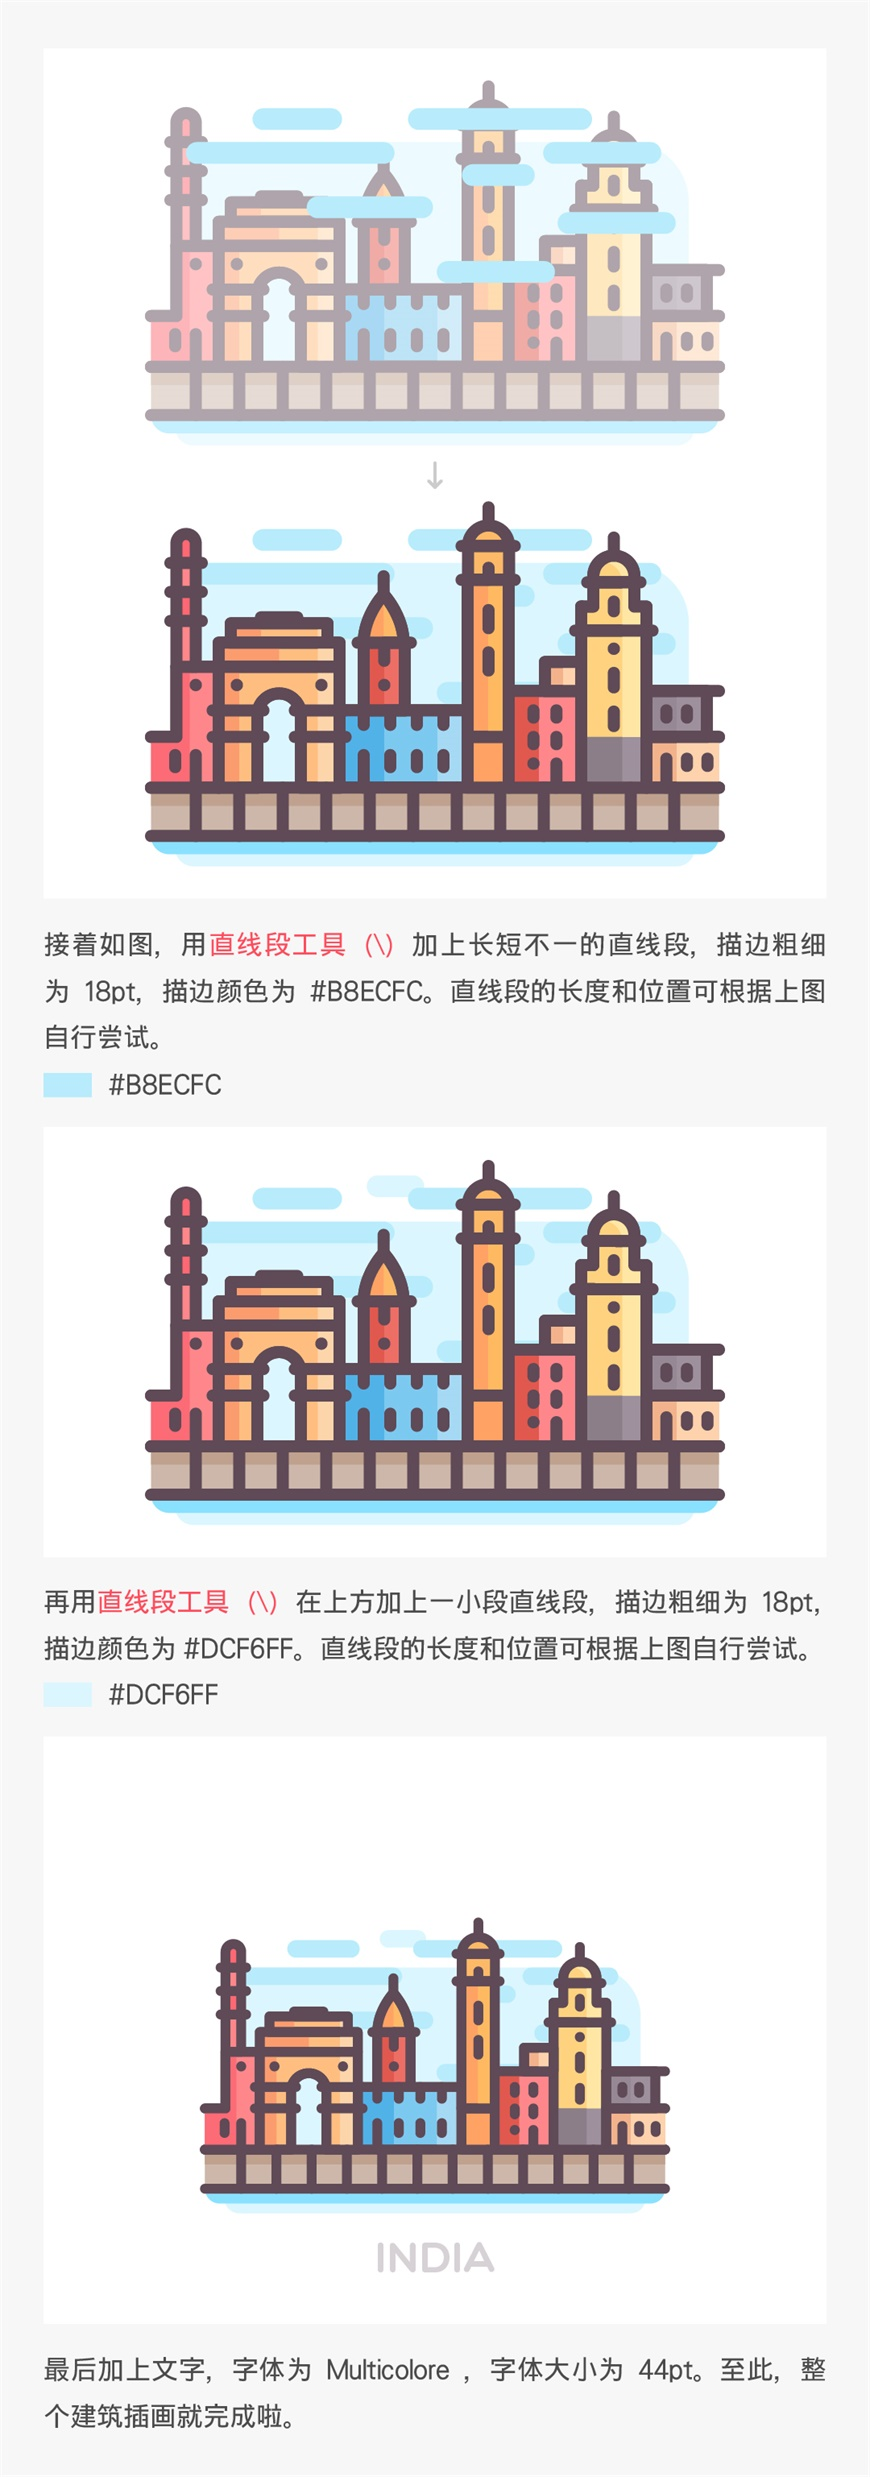 AI入门教程!手把手教你绘制印度城市描边场景插画